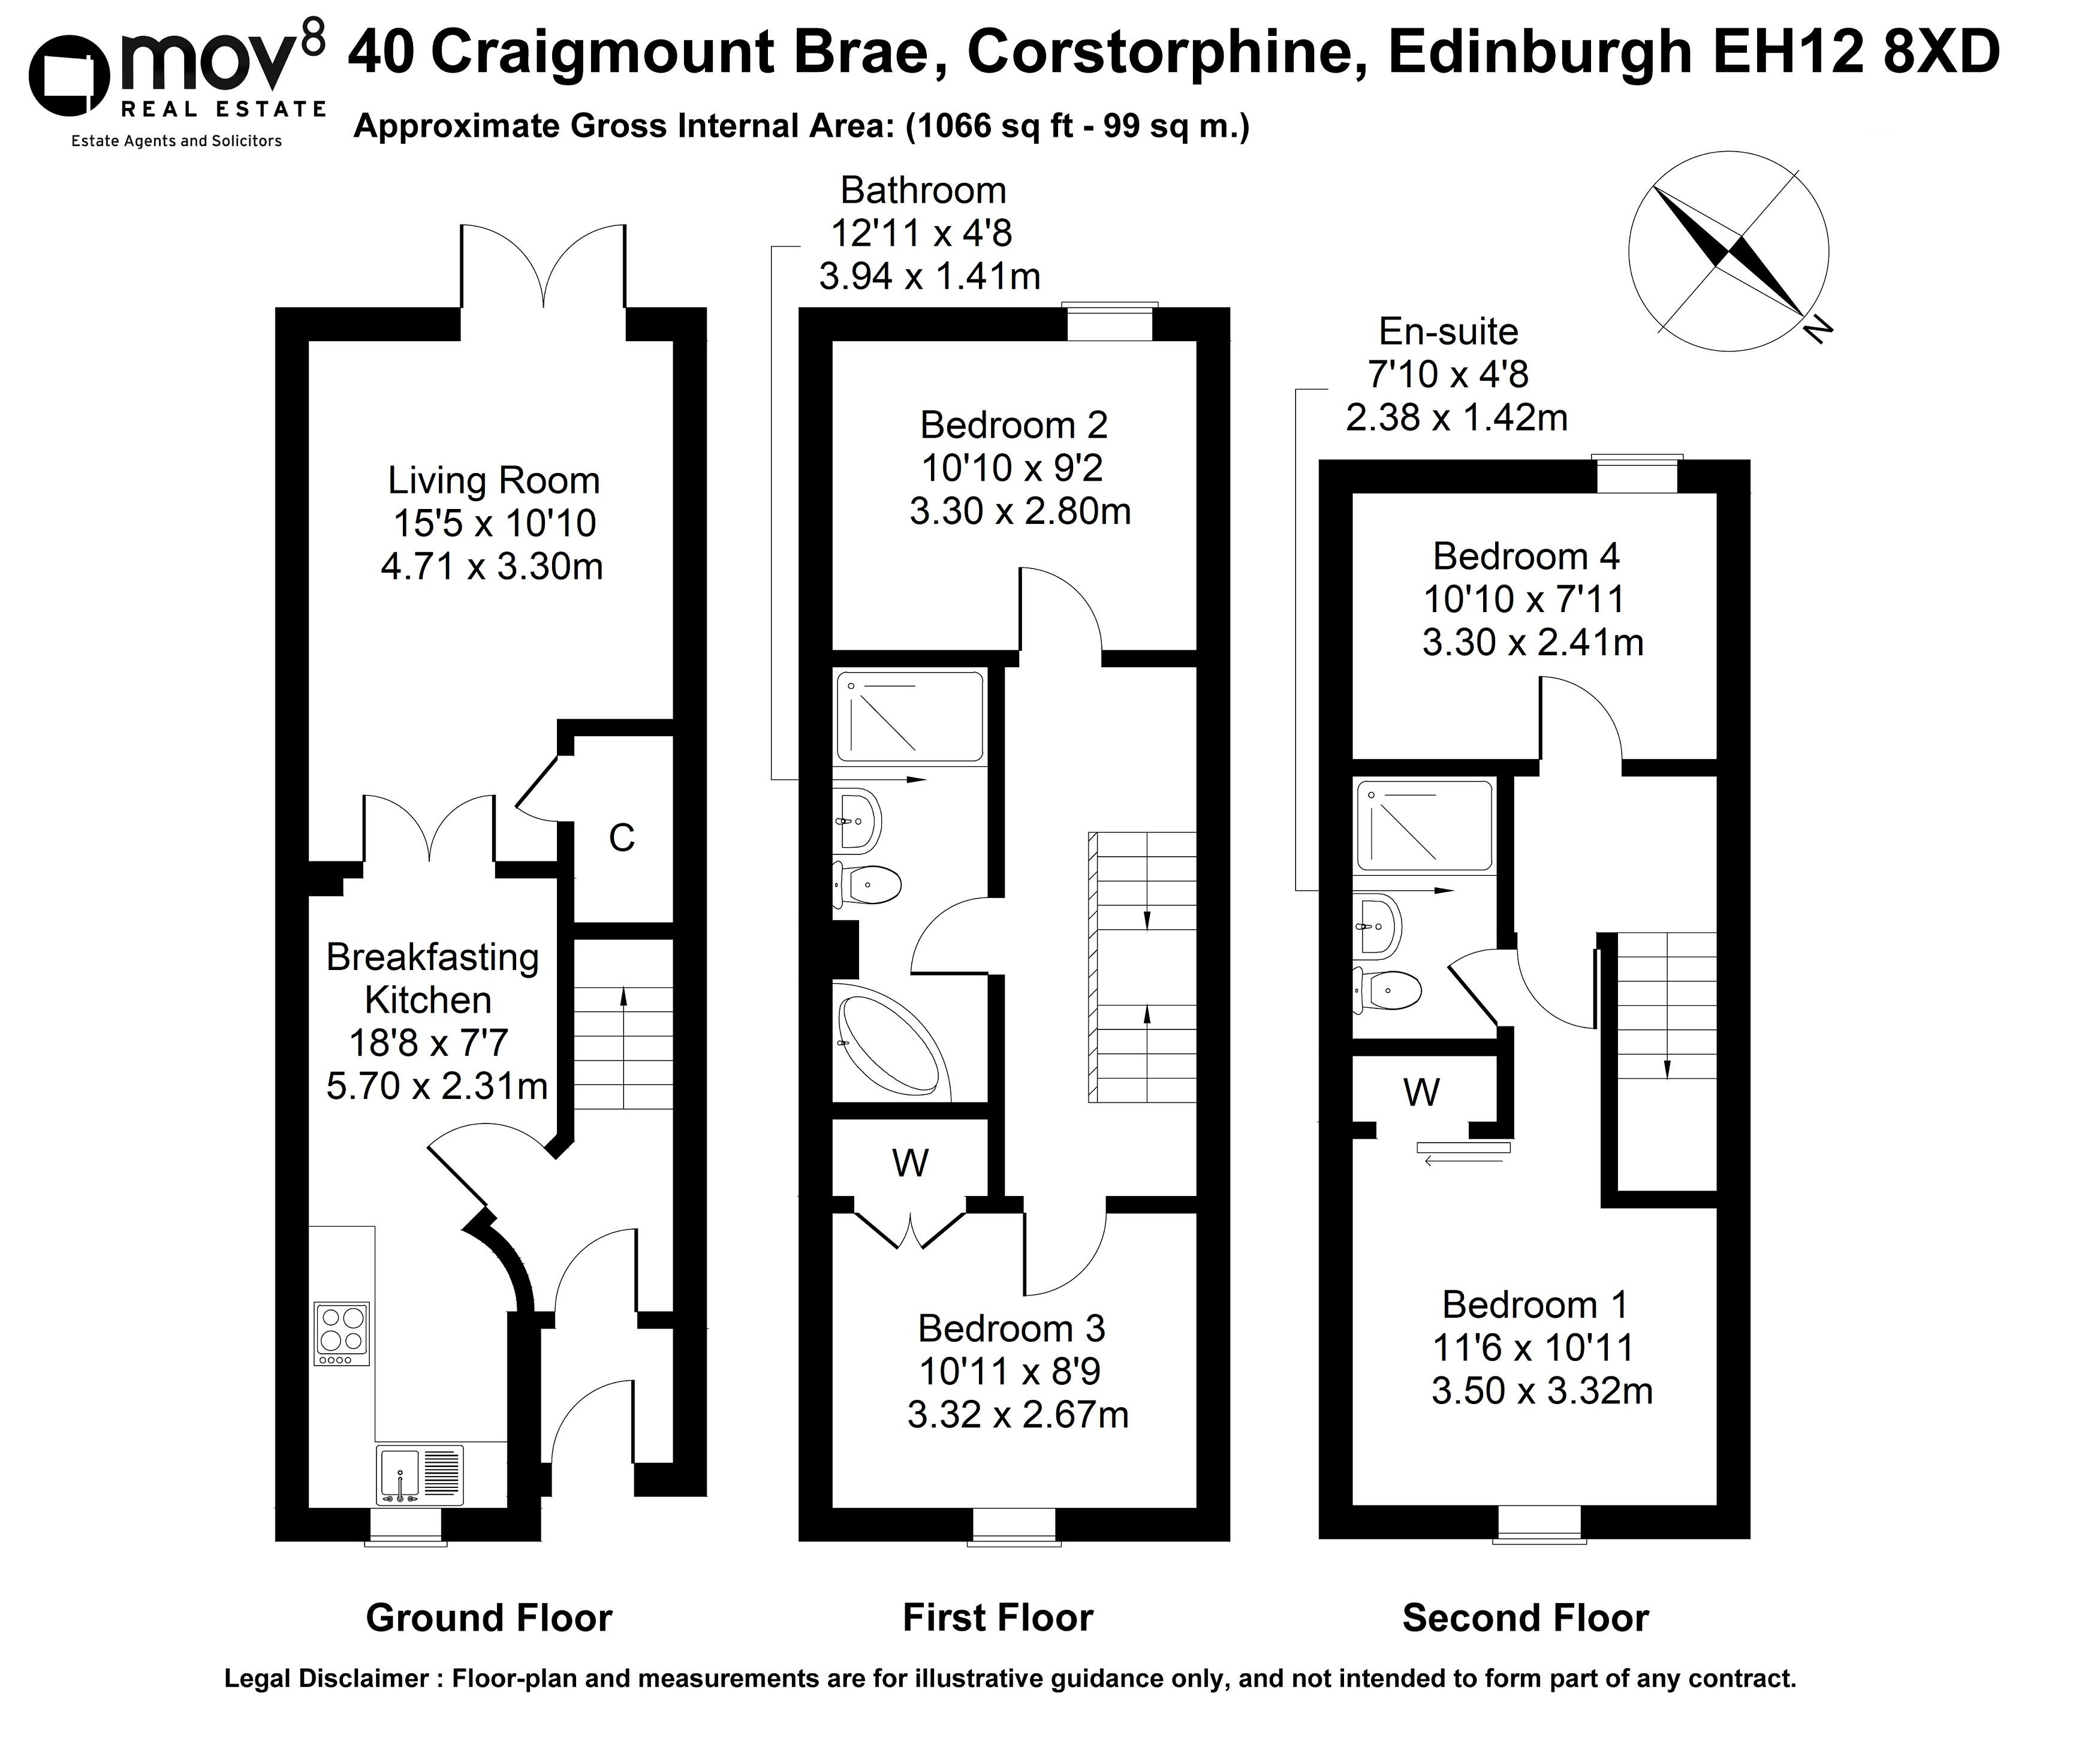 Floorplan 1 of 40 Craigmount Brae, Corstorphine, Edinburgh, EH12 8XD